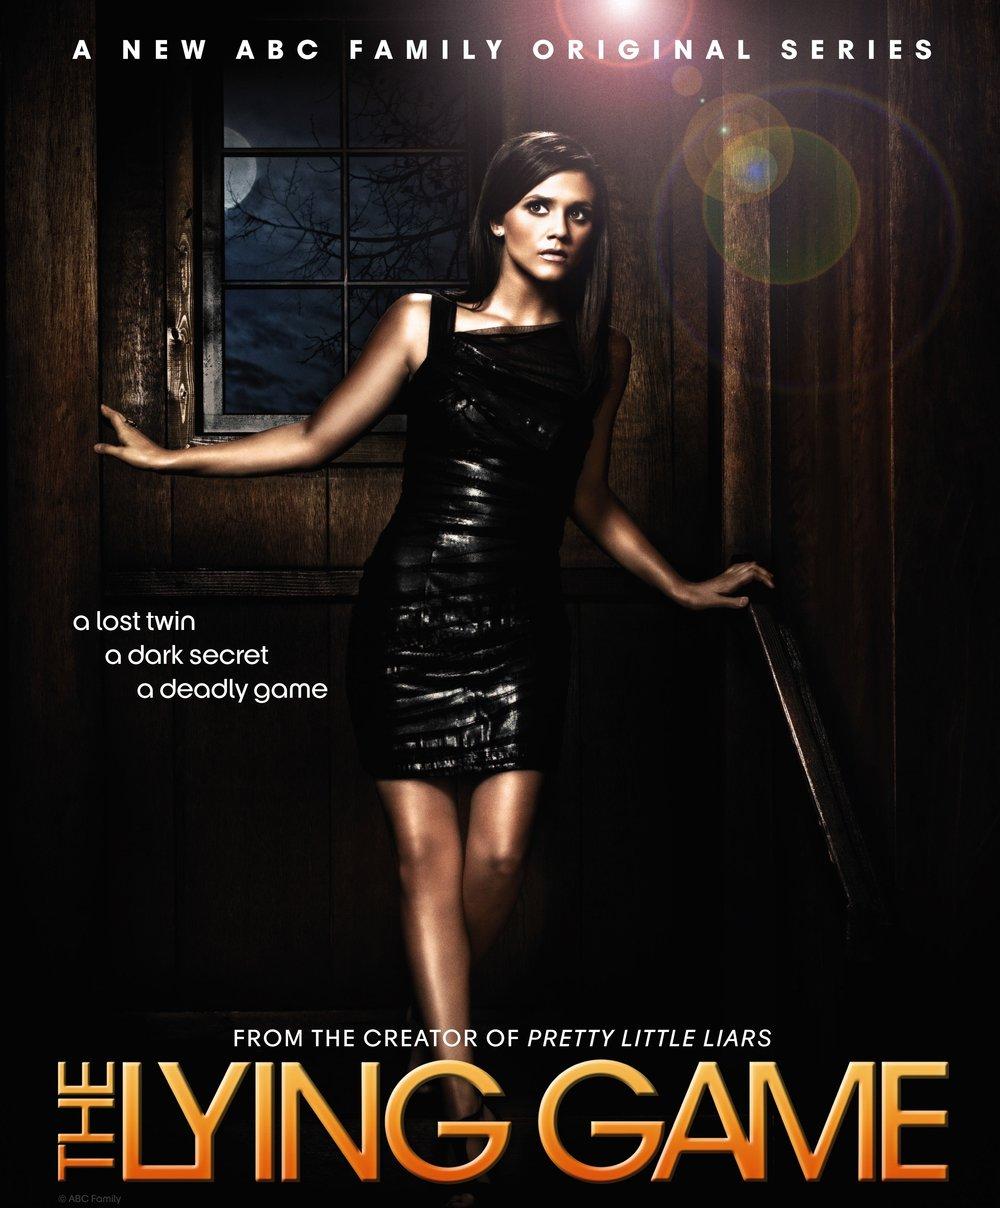 The-Lying-Game-Poster 2.jpg